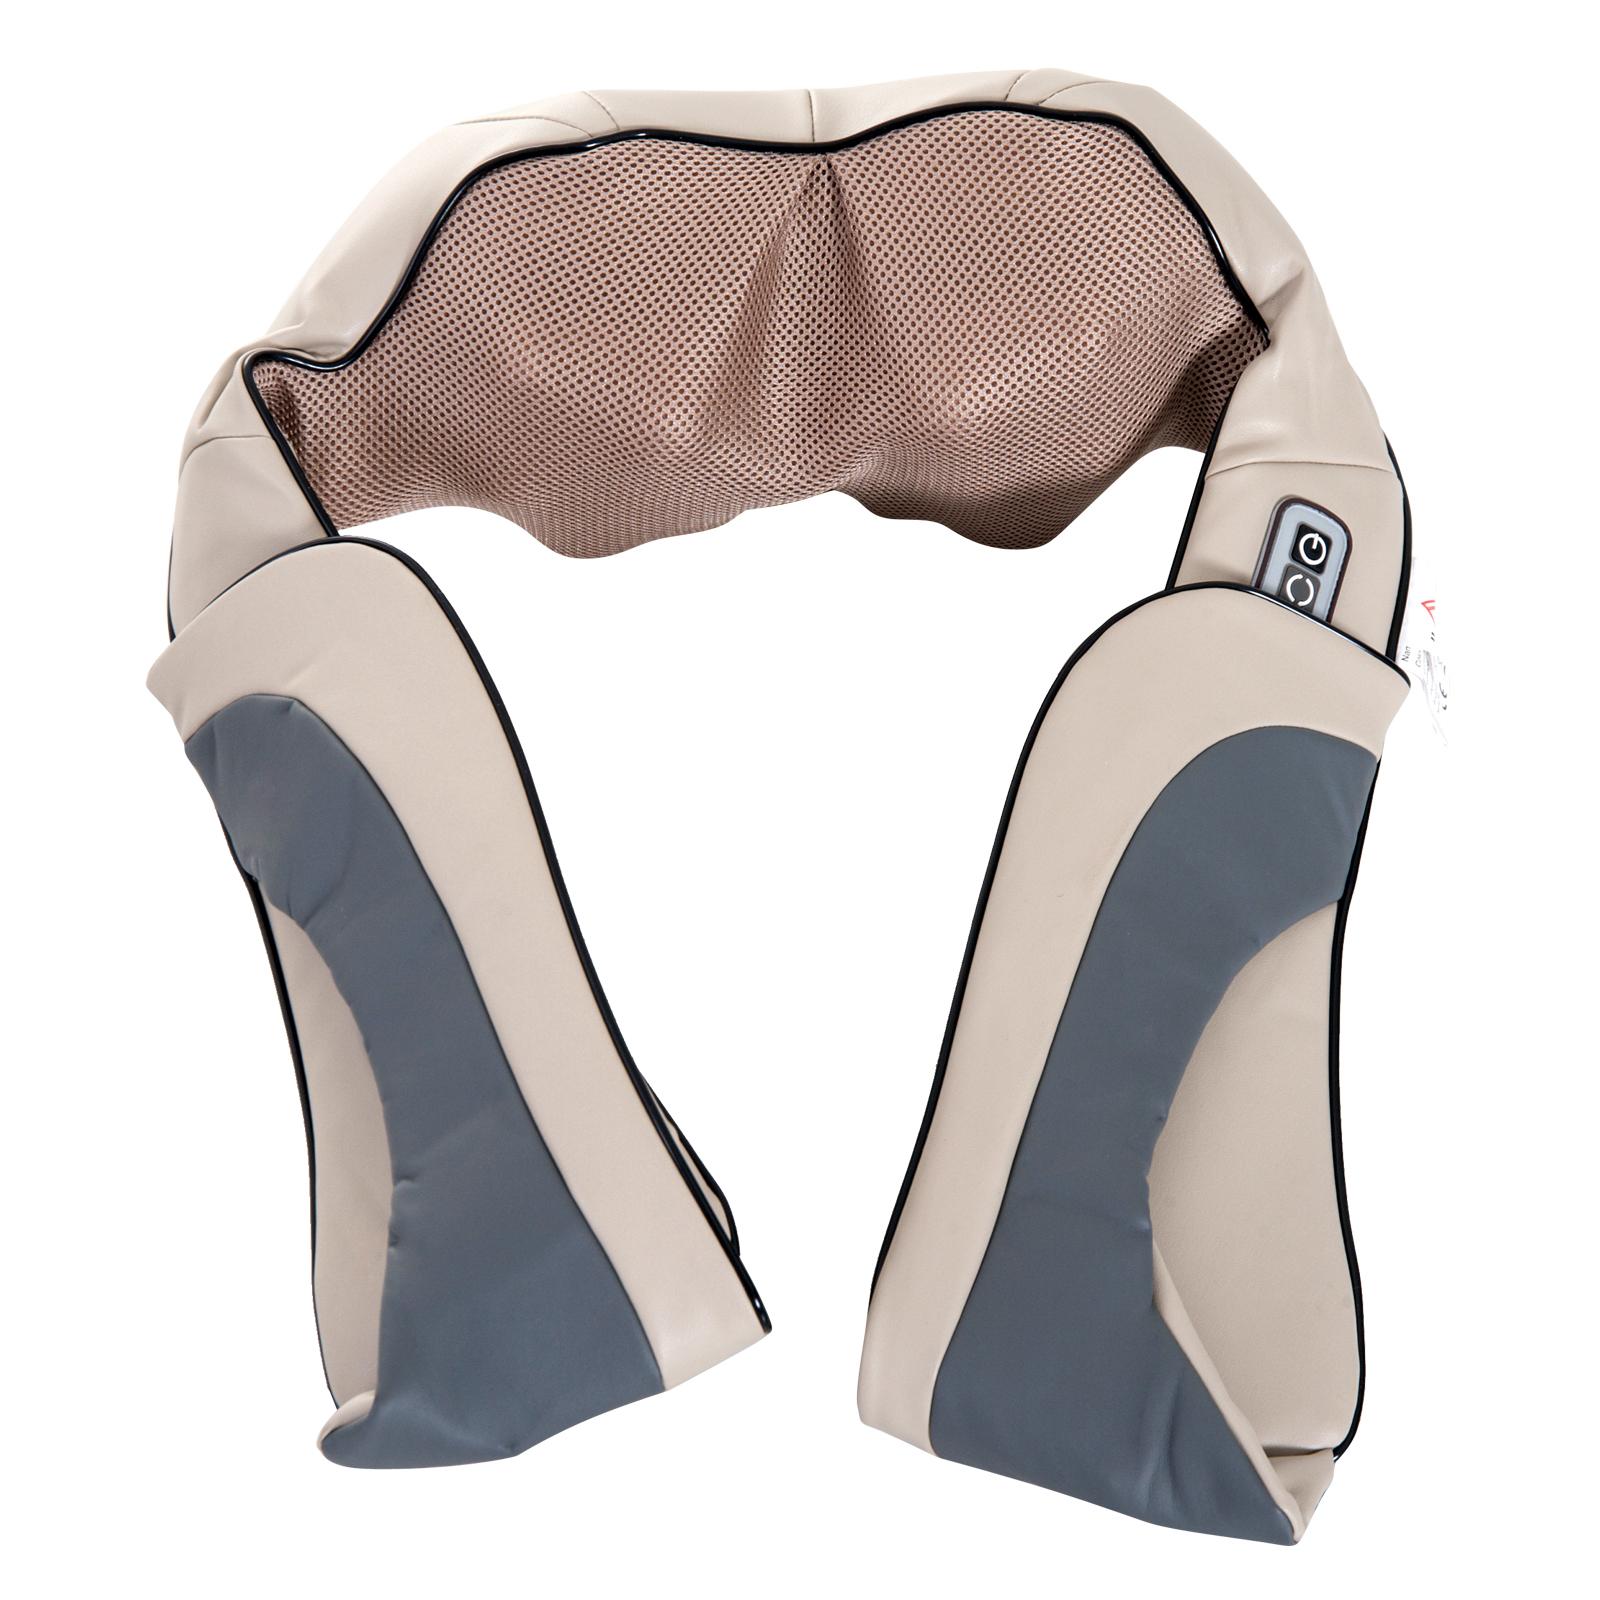 Homcom Massaggiatore Elettrico Ergonomico Cervicale con Riscaldamento